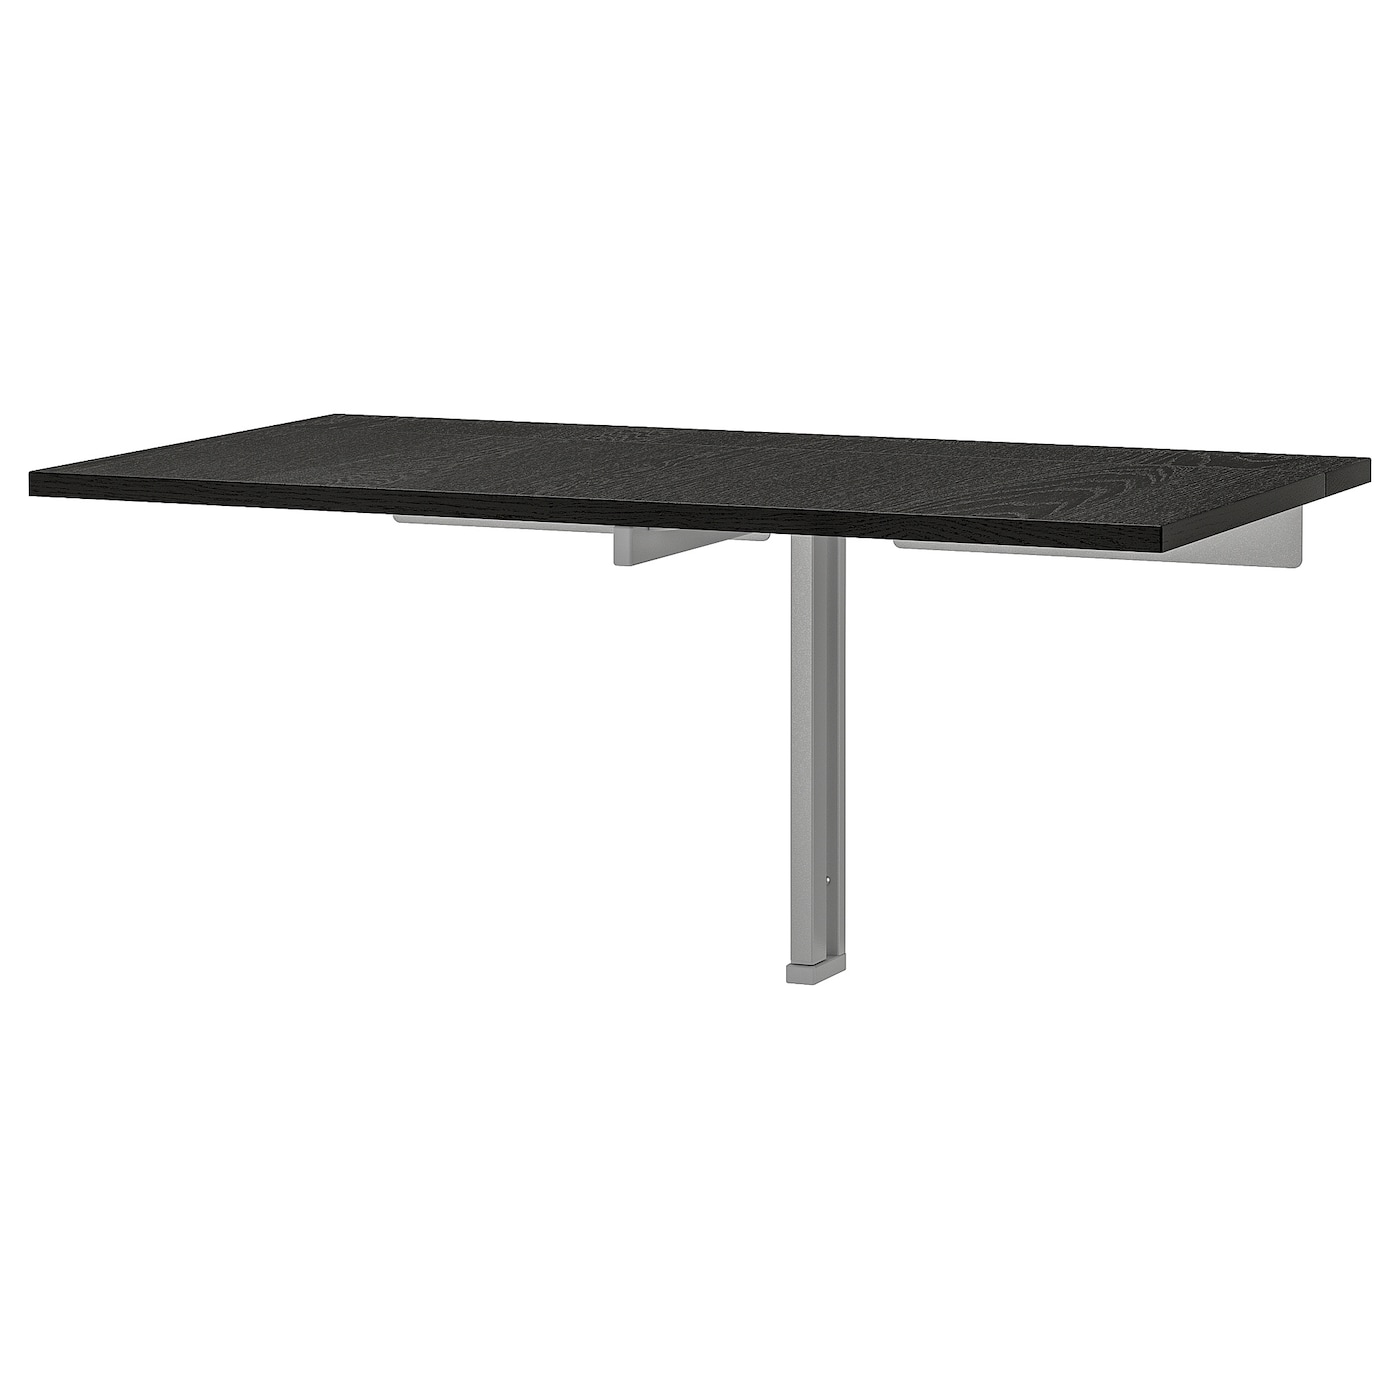 - BJURSTA Wall-mounted Drop-leaf Table - Brown-black - IKEA